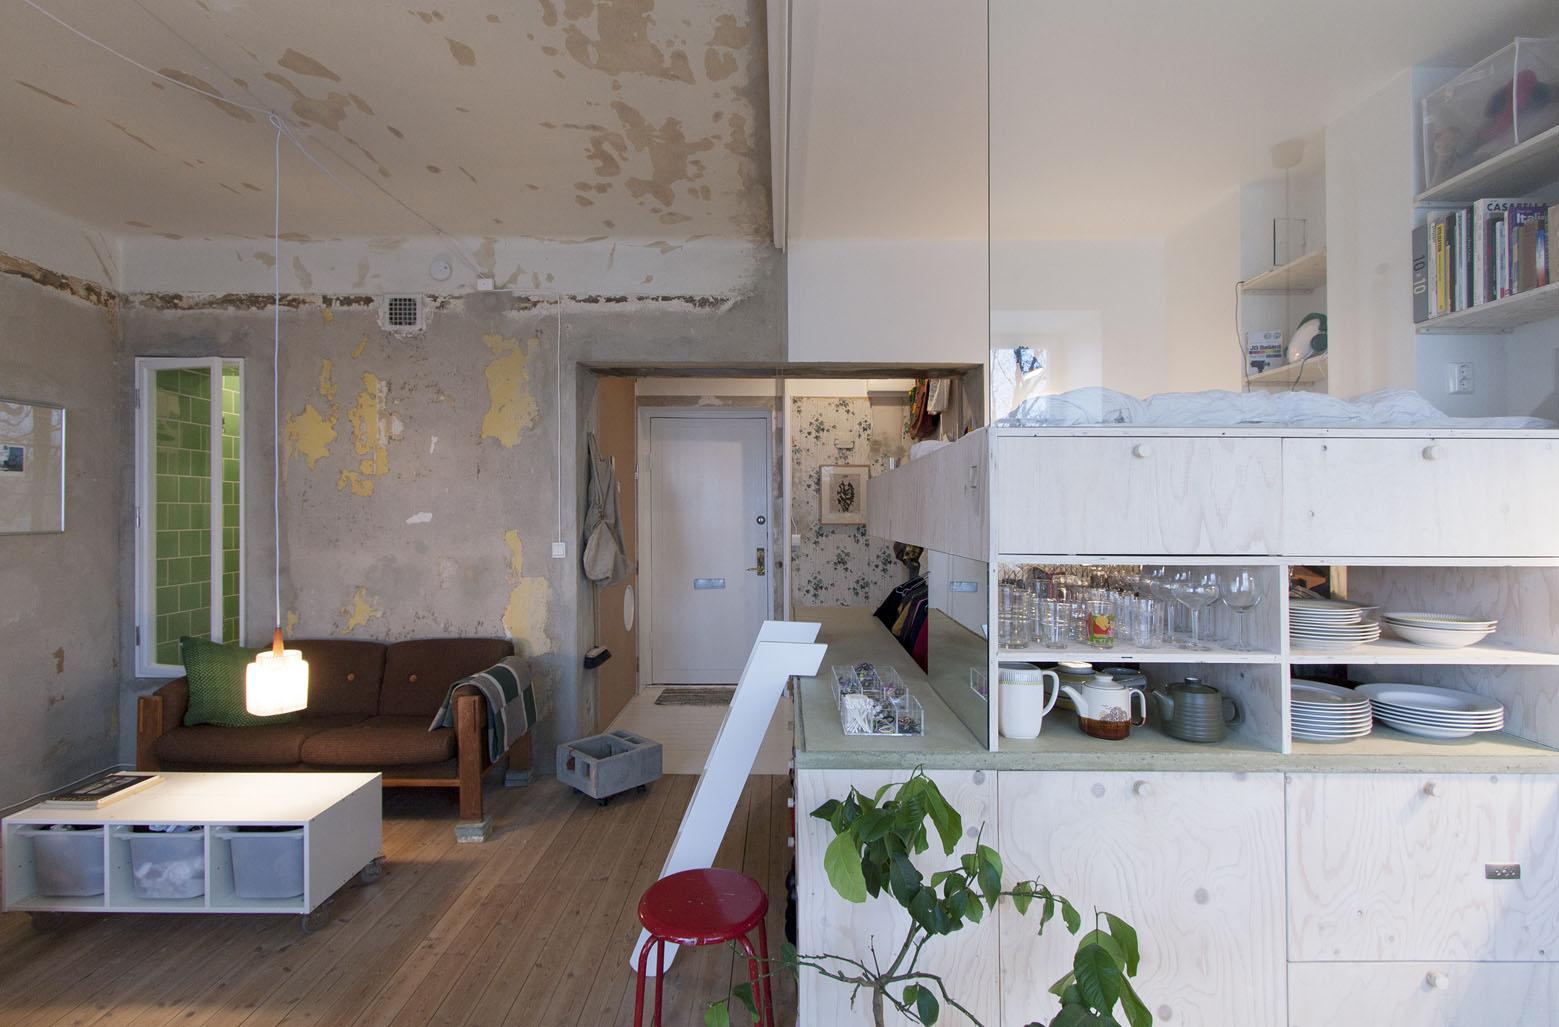 Loft Studio Apartment Inexpensive Studio Apartment Renovation With All In One Kitchen